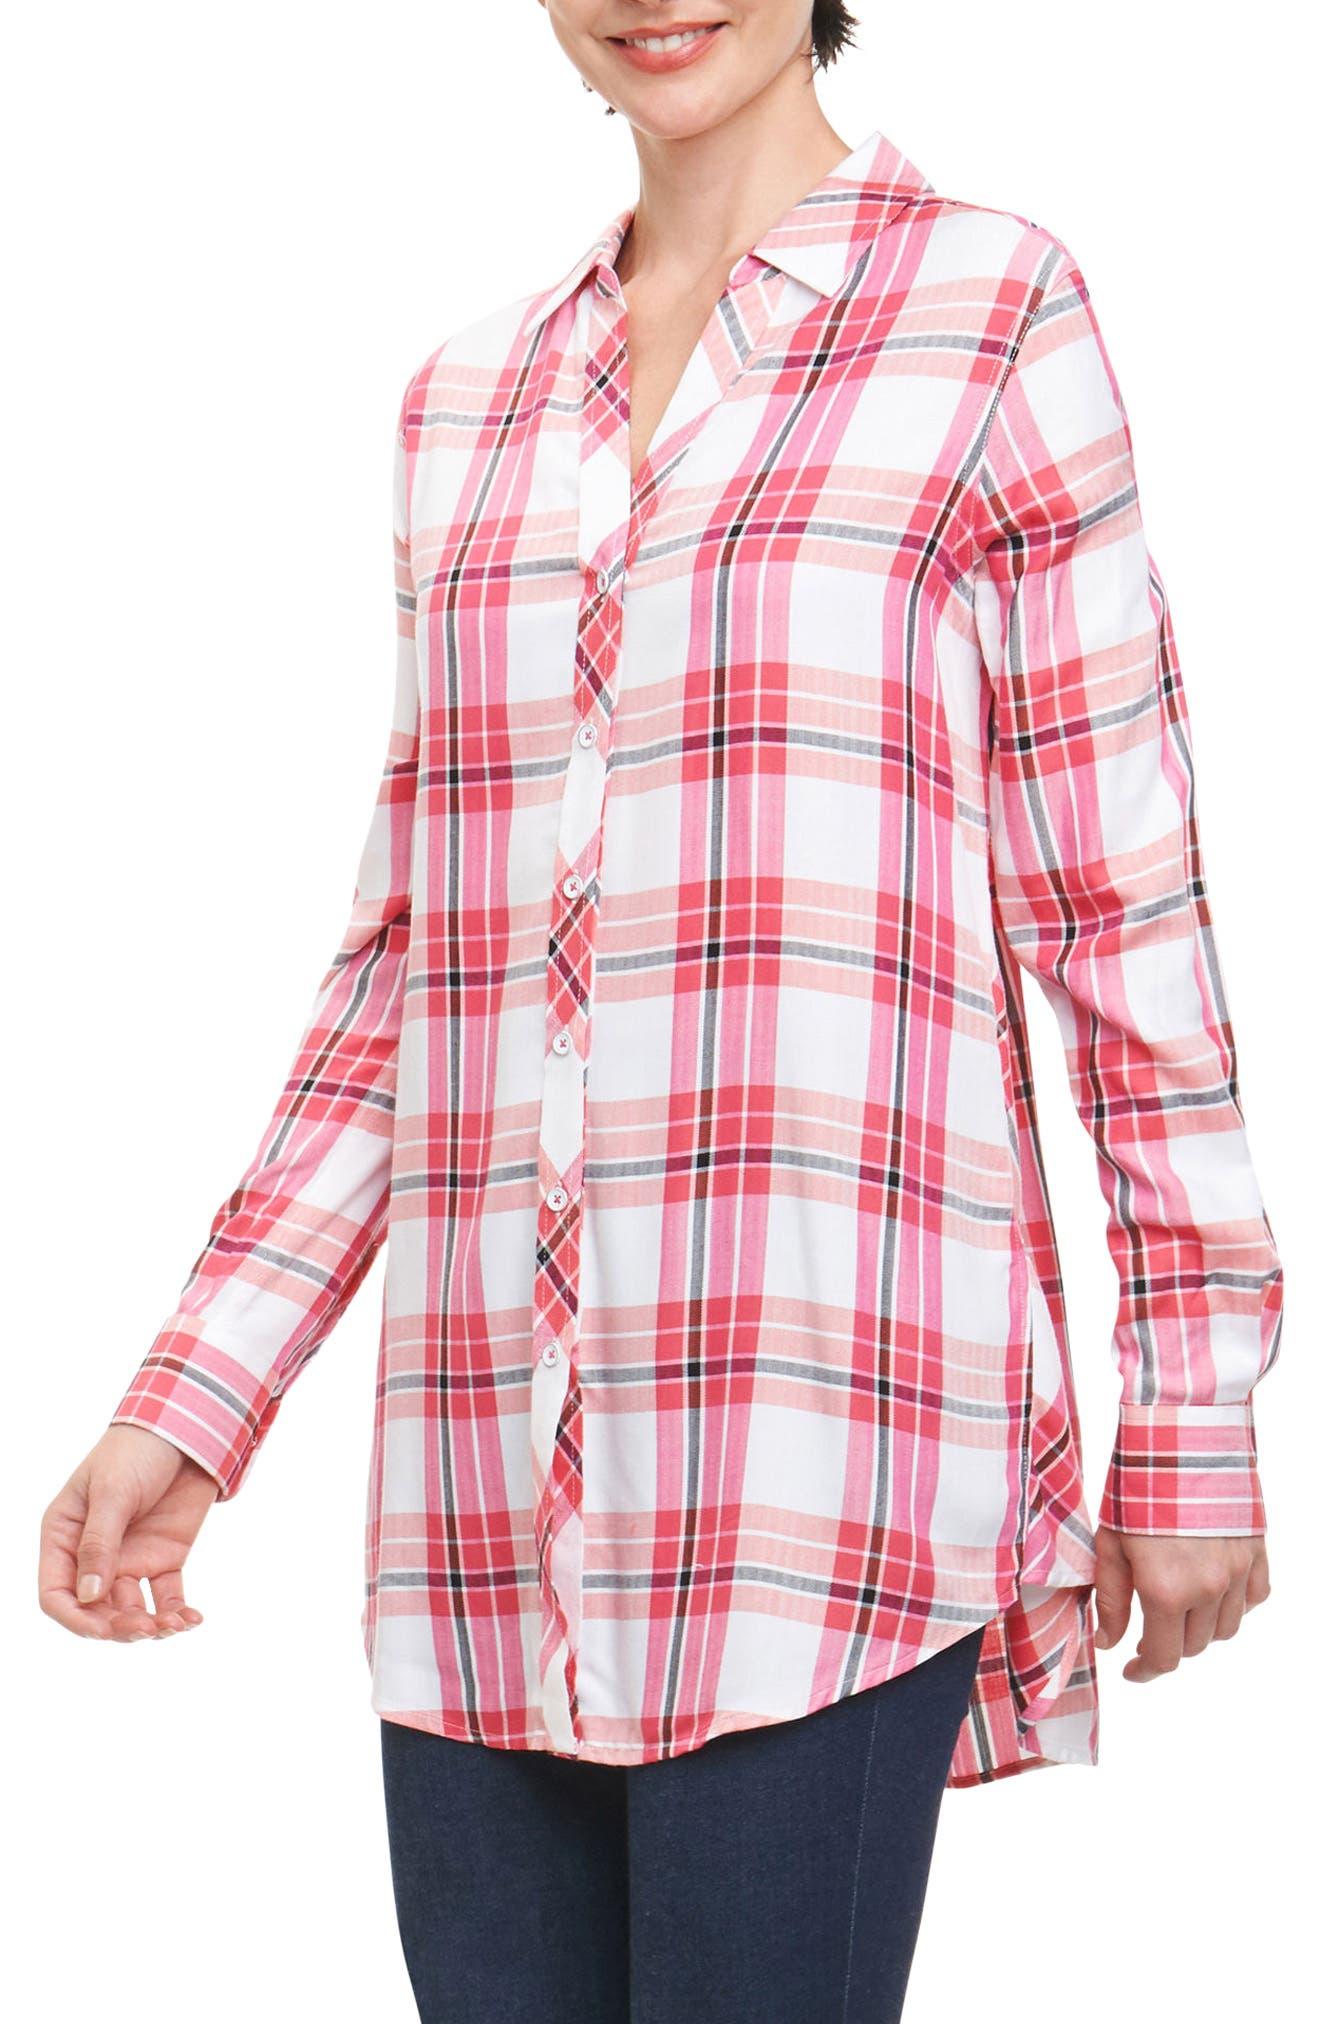 Fay Pinktini Plaid Shirt,                             Main thumbnail 1, color,                             MULTI